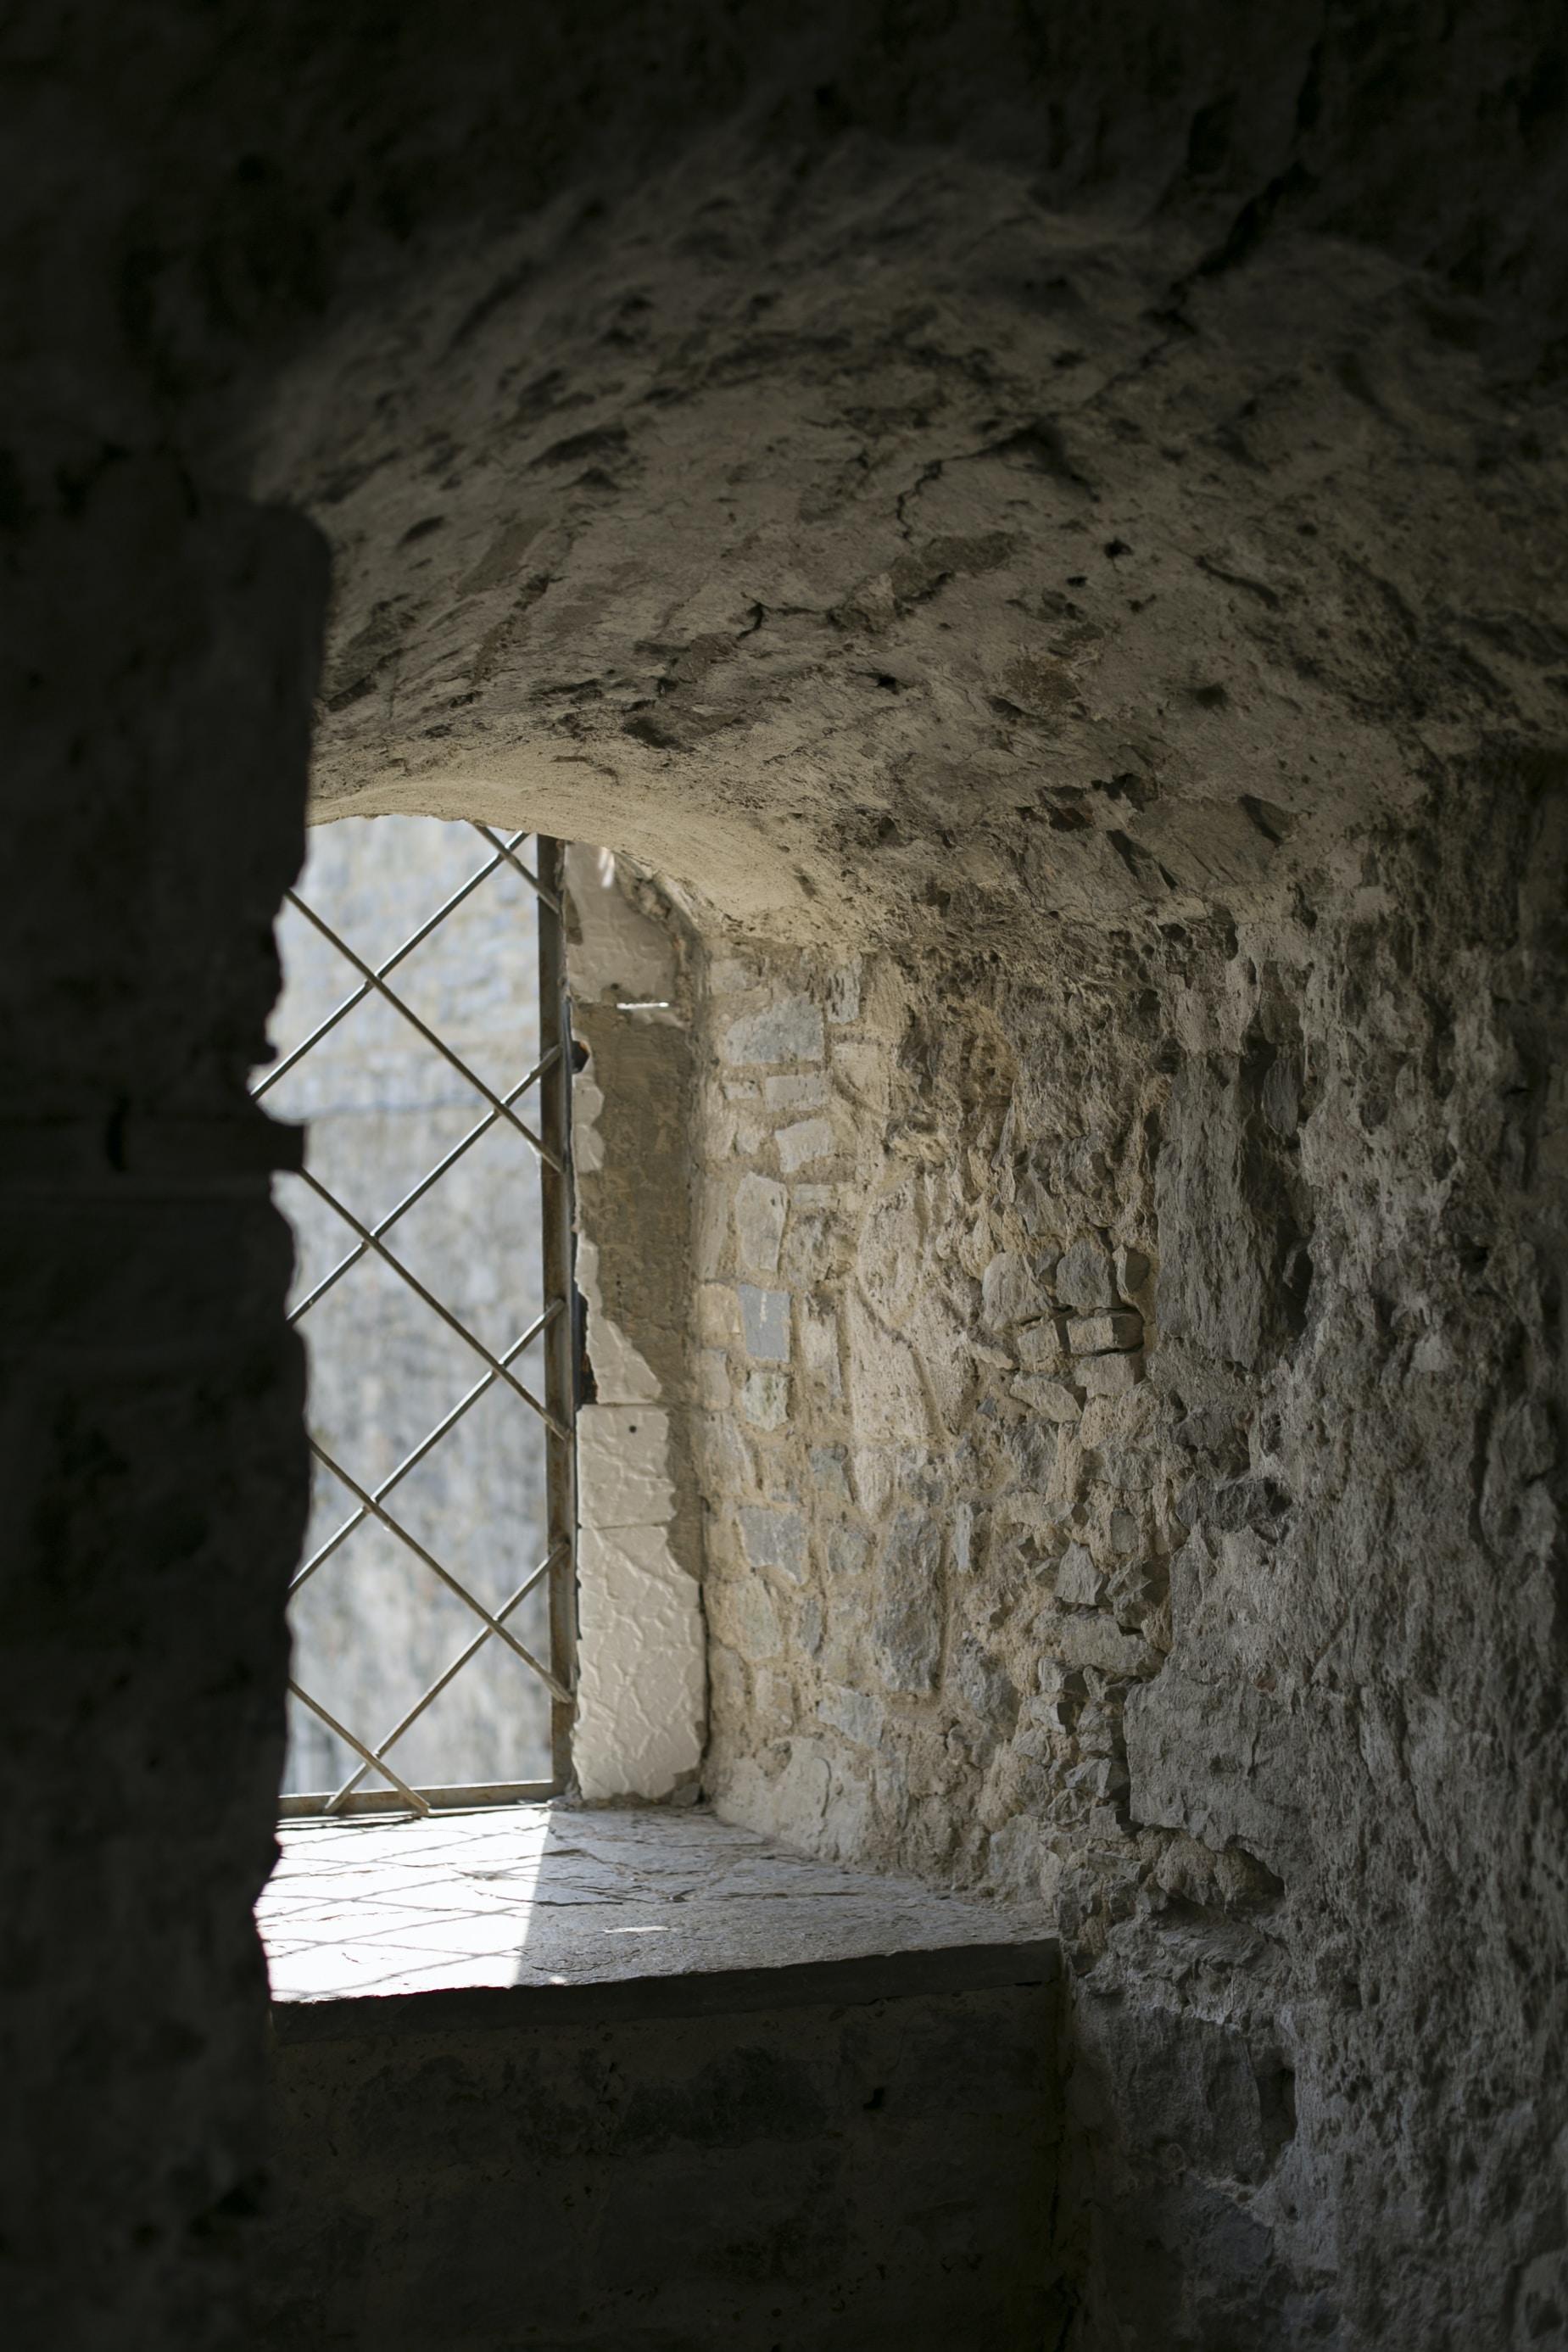 photo of rock house near window